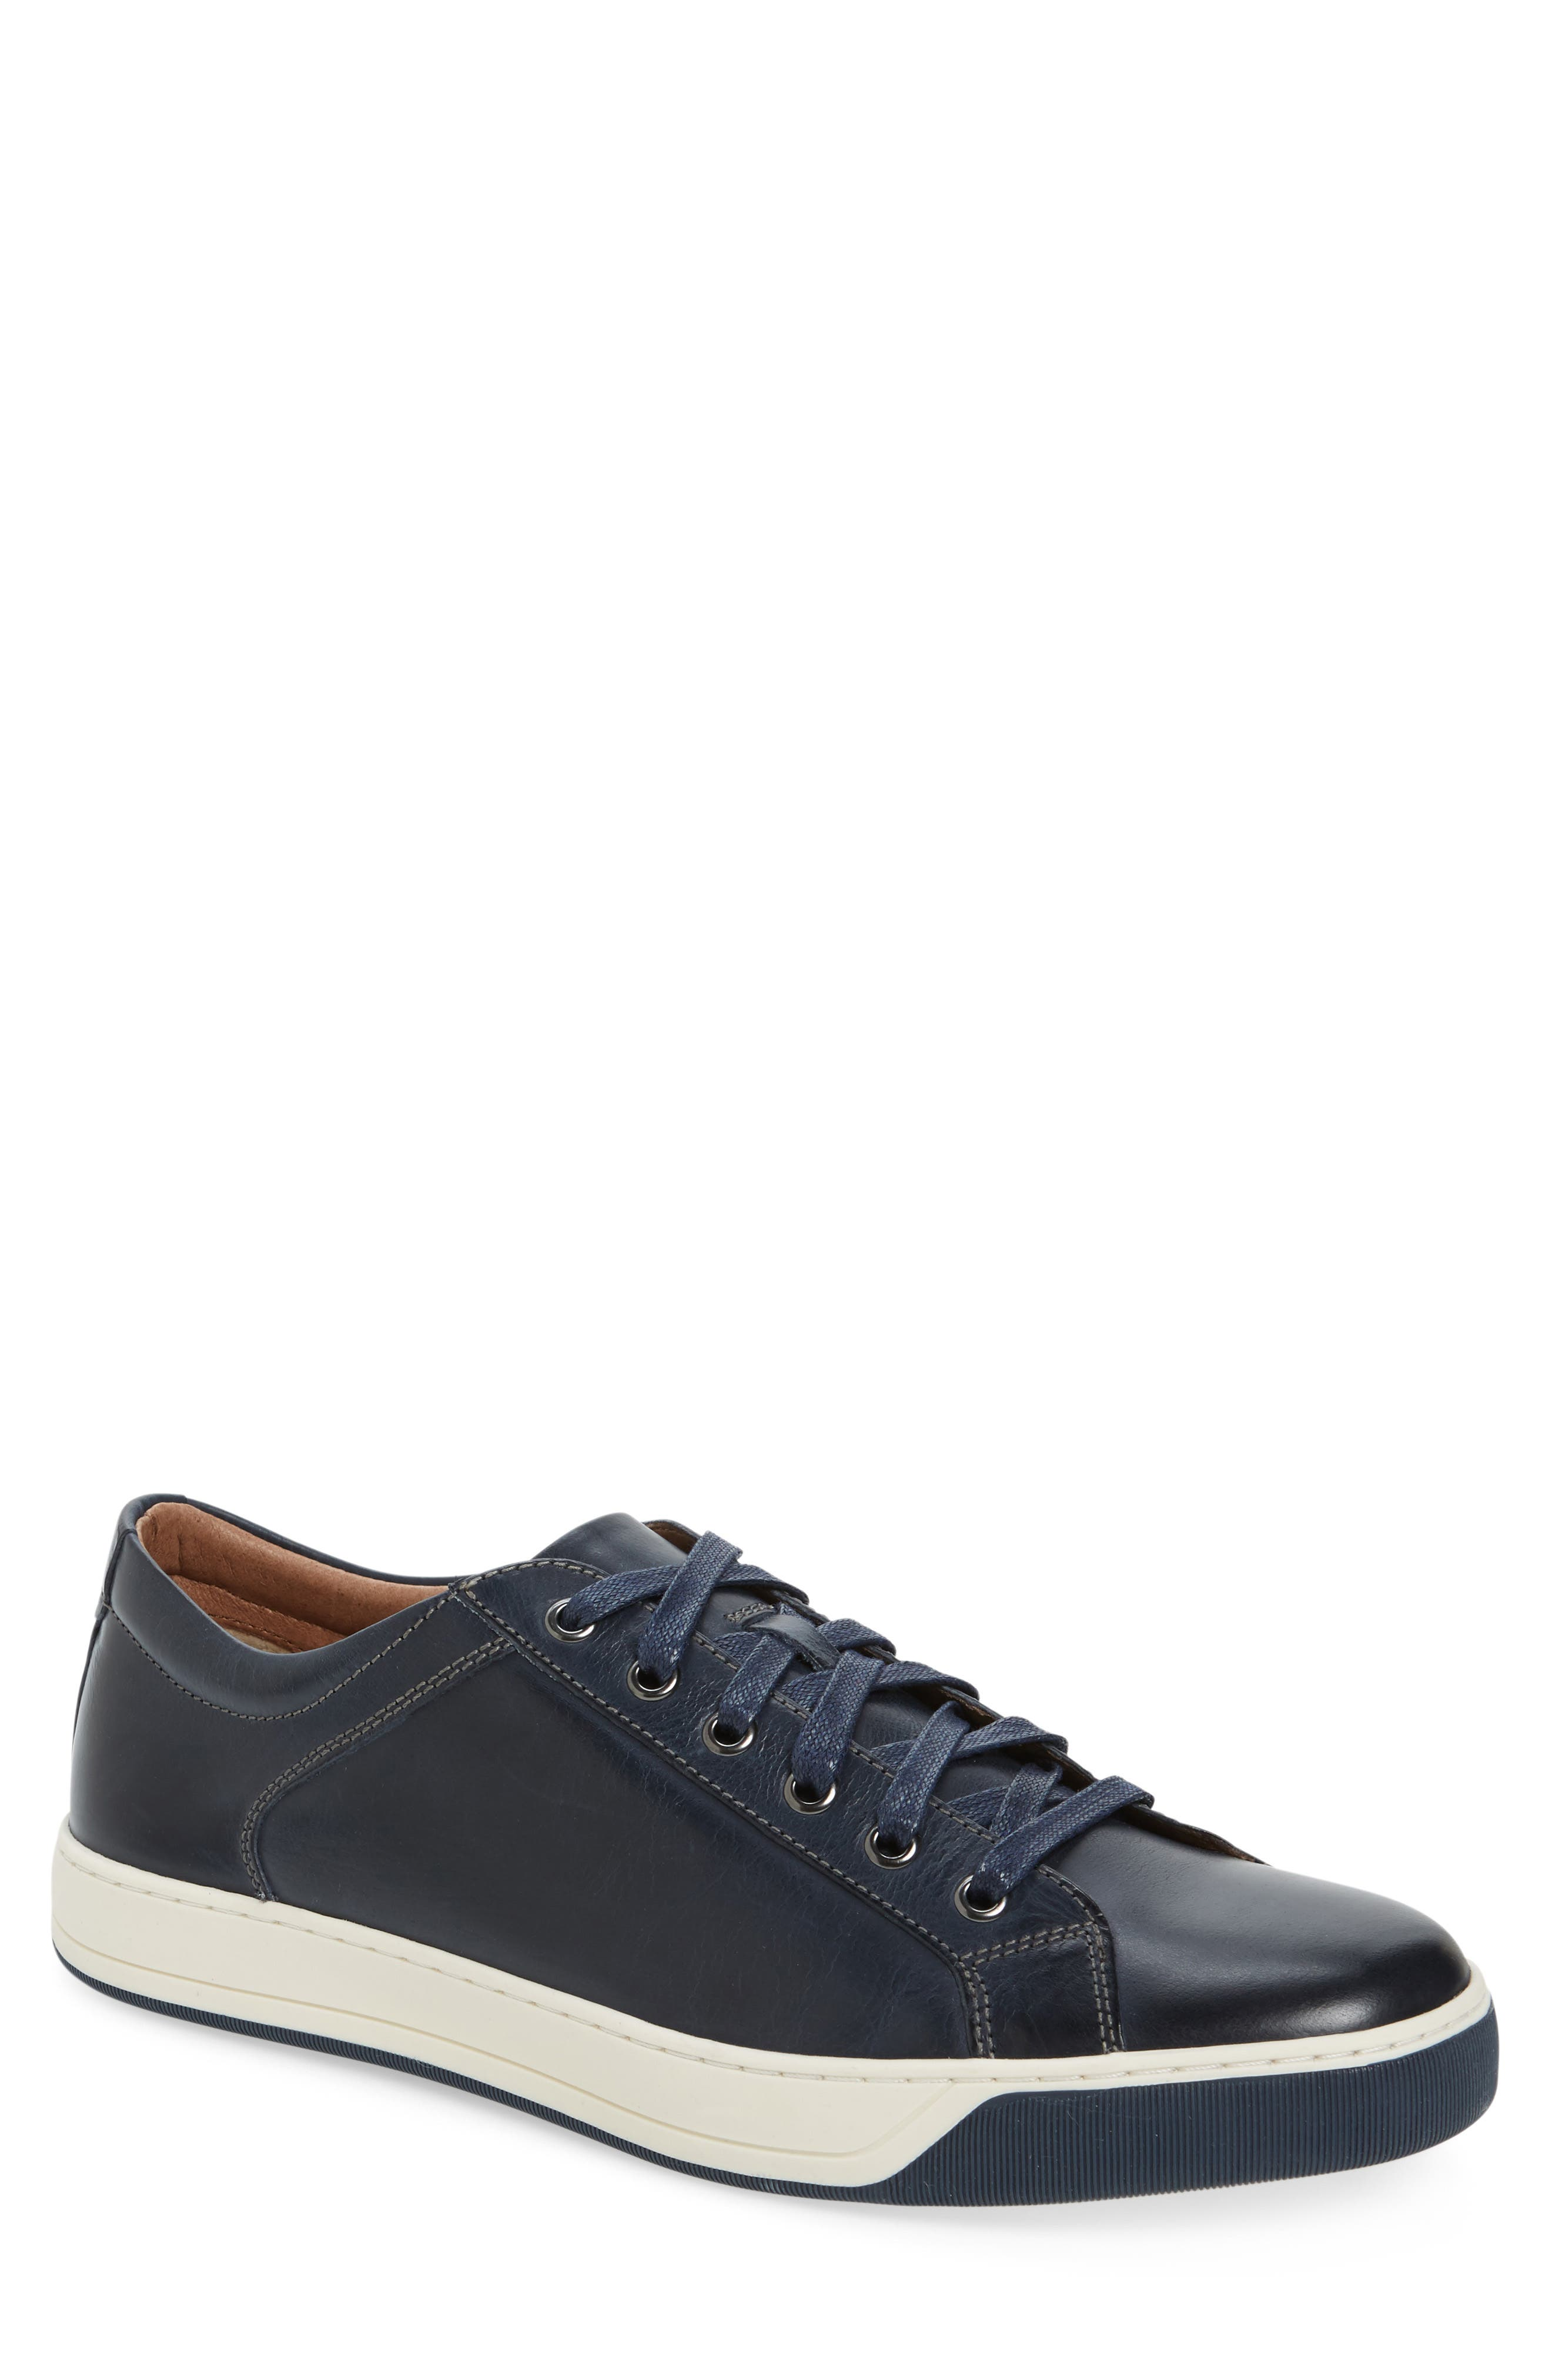 J&M 1850,                             Allister Sneaker,                             Main thumbnail 1, color,                             NAVY/ NAVY LEATHER